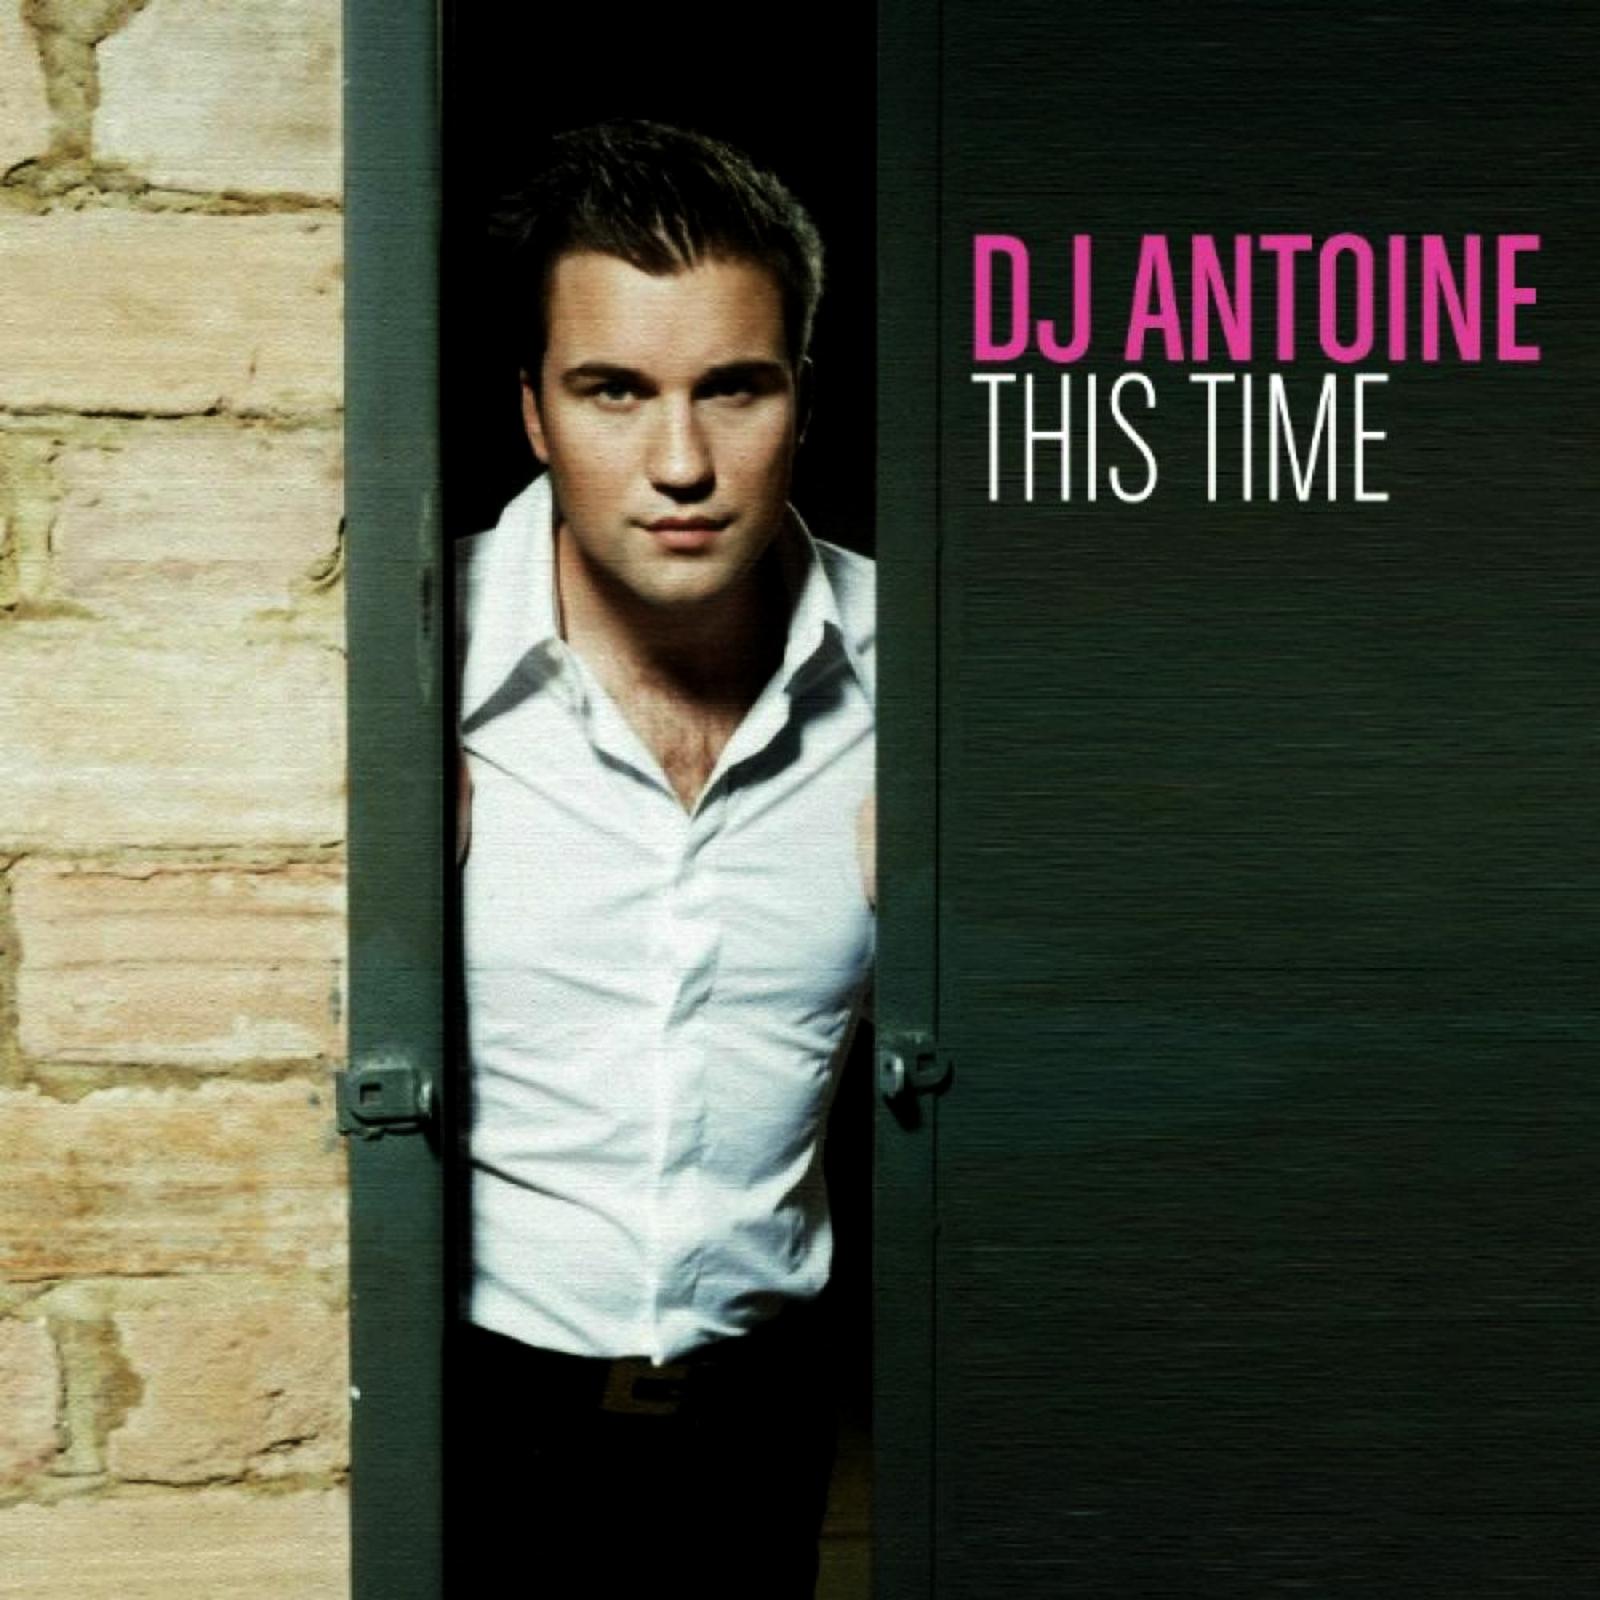 http://1.bp.blogspot.com/-BJI2Bl3cTO0/T-har9UzPeI/AAAAAAAACRs/y2DKm15RN-0/s1600/Dj_Antoine_This_Time_Cover_HD_Wallpaper.jpg